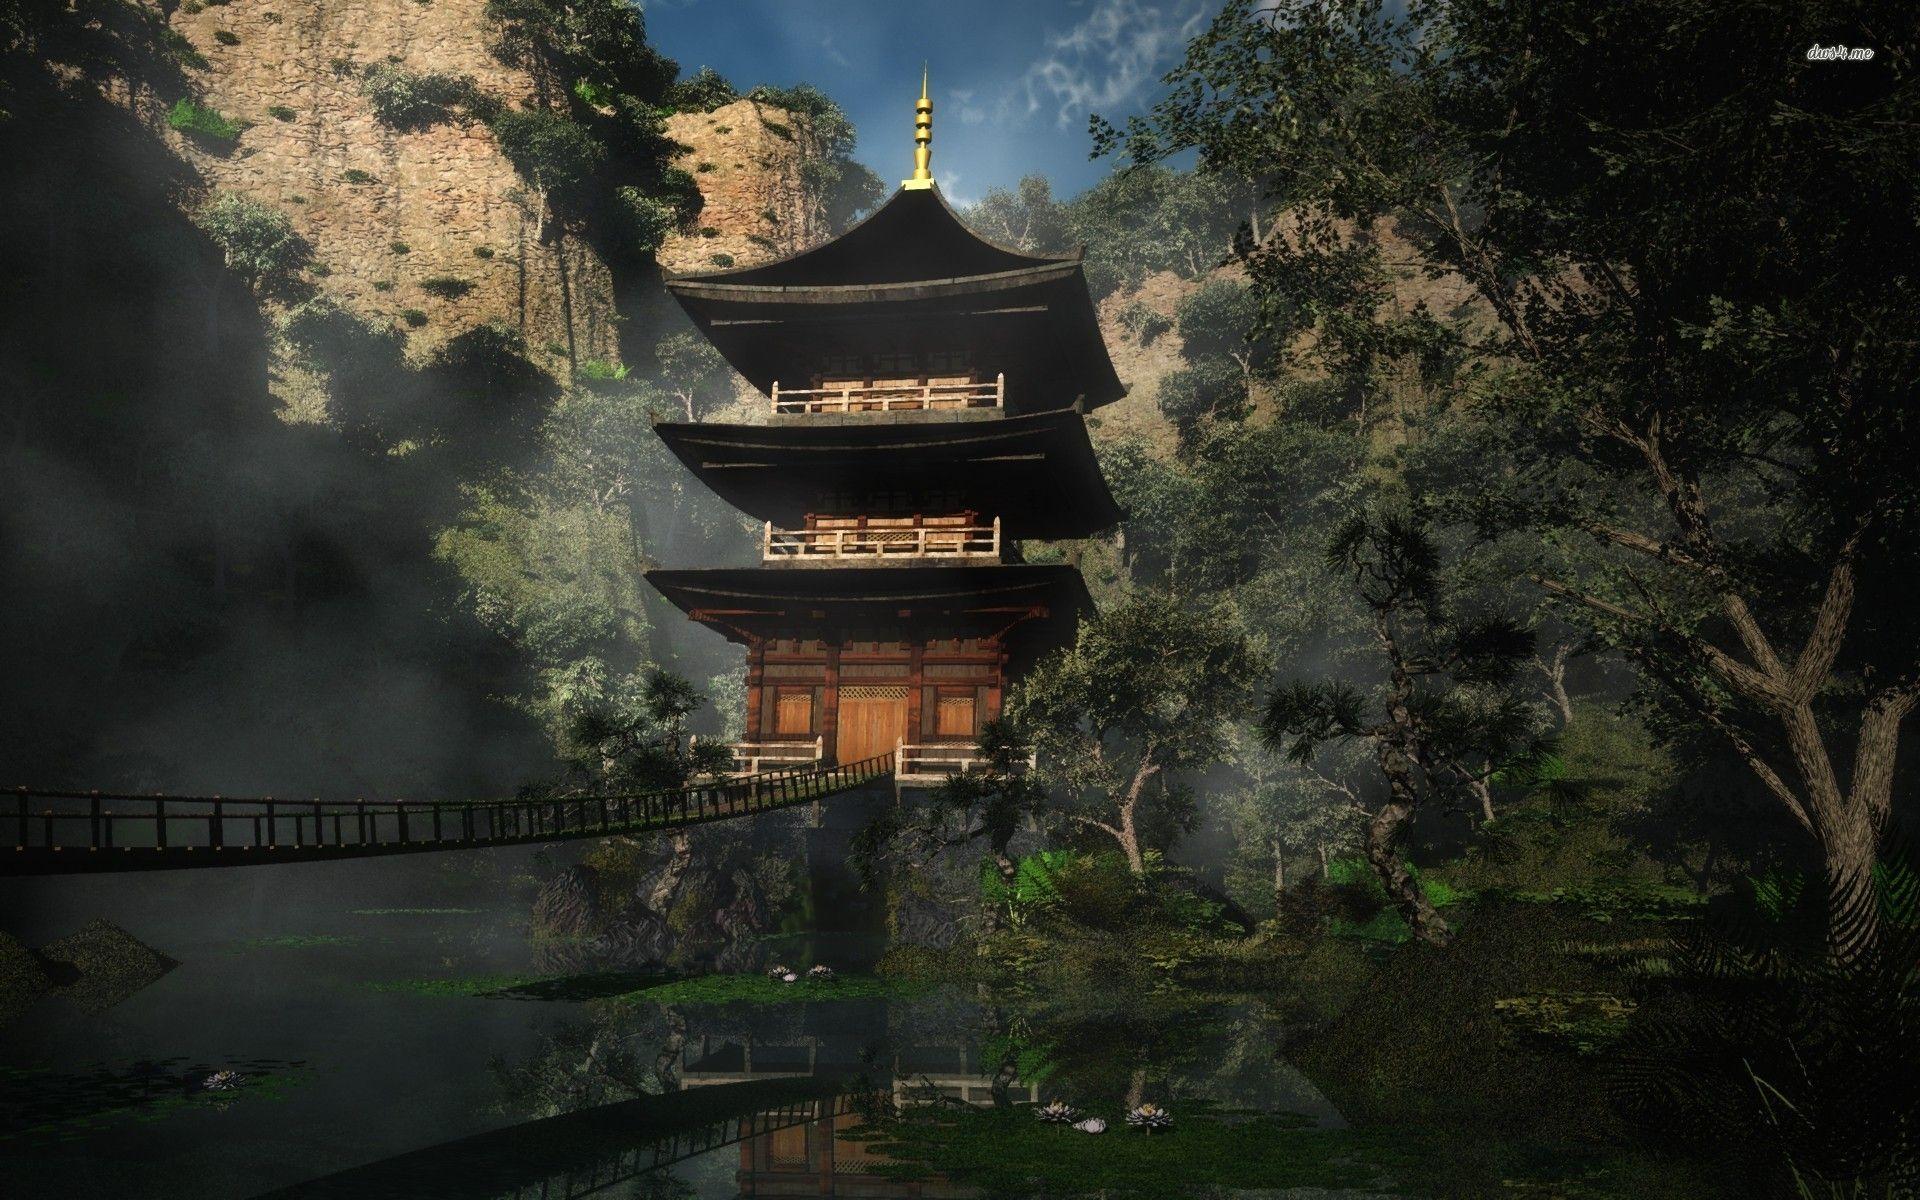 japan architecture wallpaper - photo #23